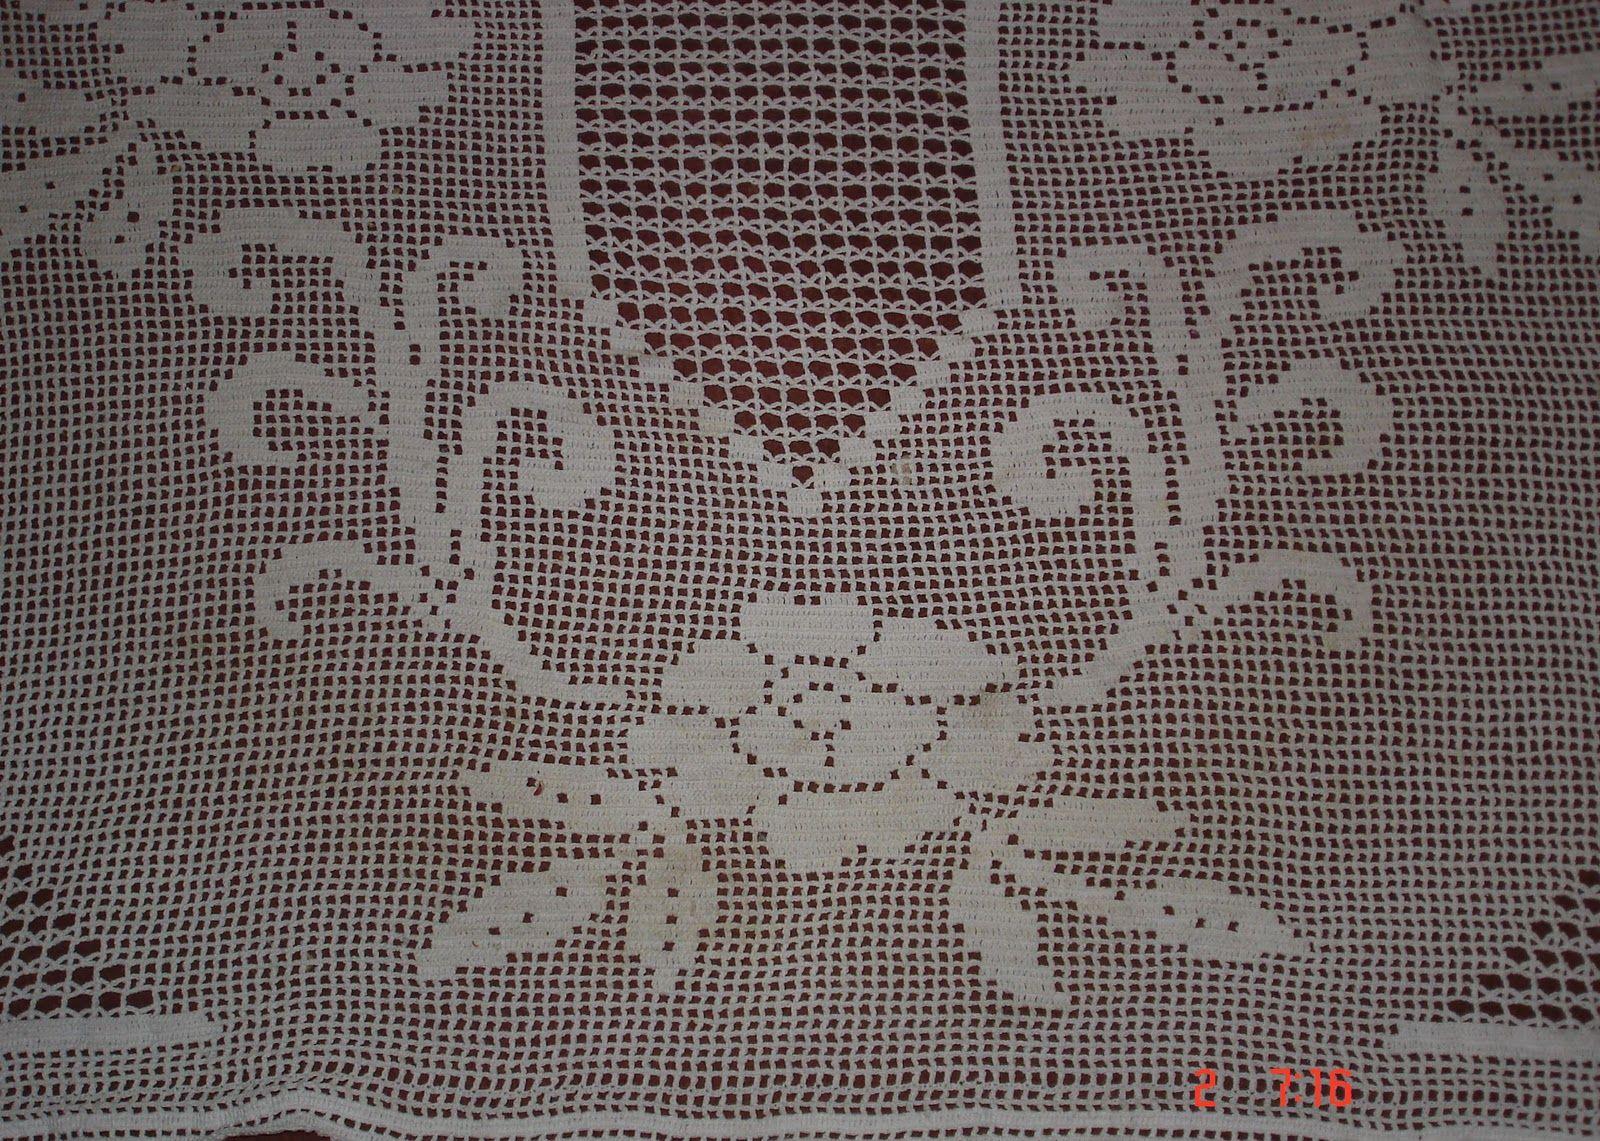 Diameter 72 Circular Tablecloth Pattern Vintage Crochet Pattern PDF for Filet Crochet Tablecloth w Dogwood Flowers Motif SKU 137-4